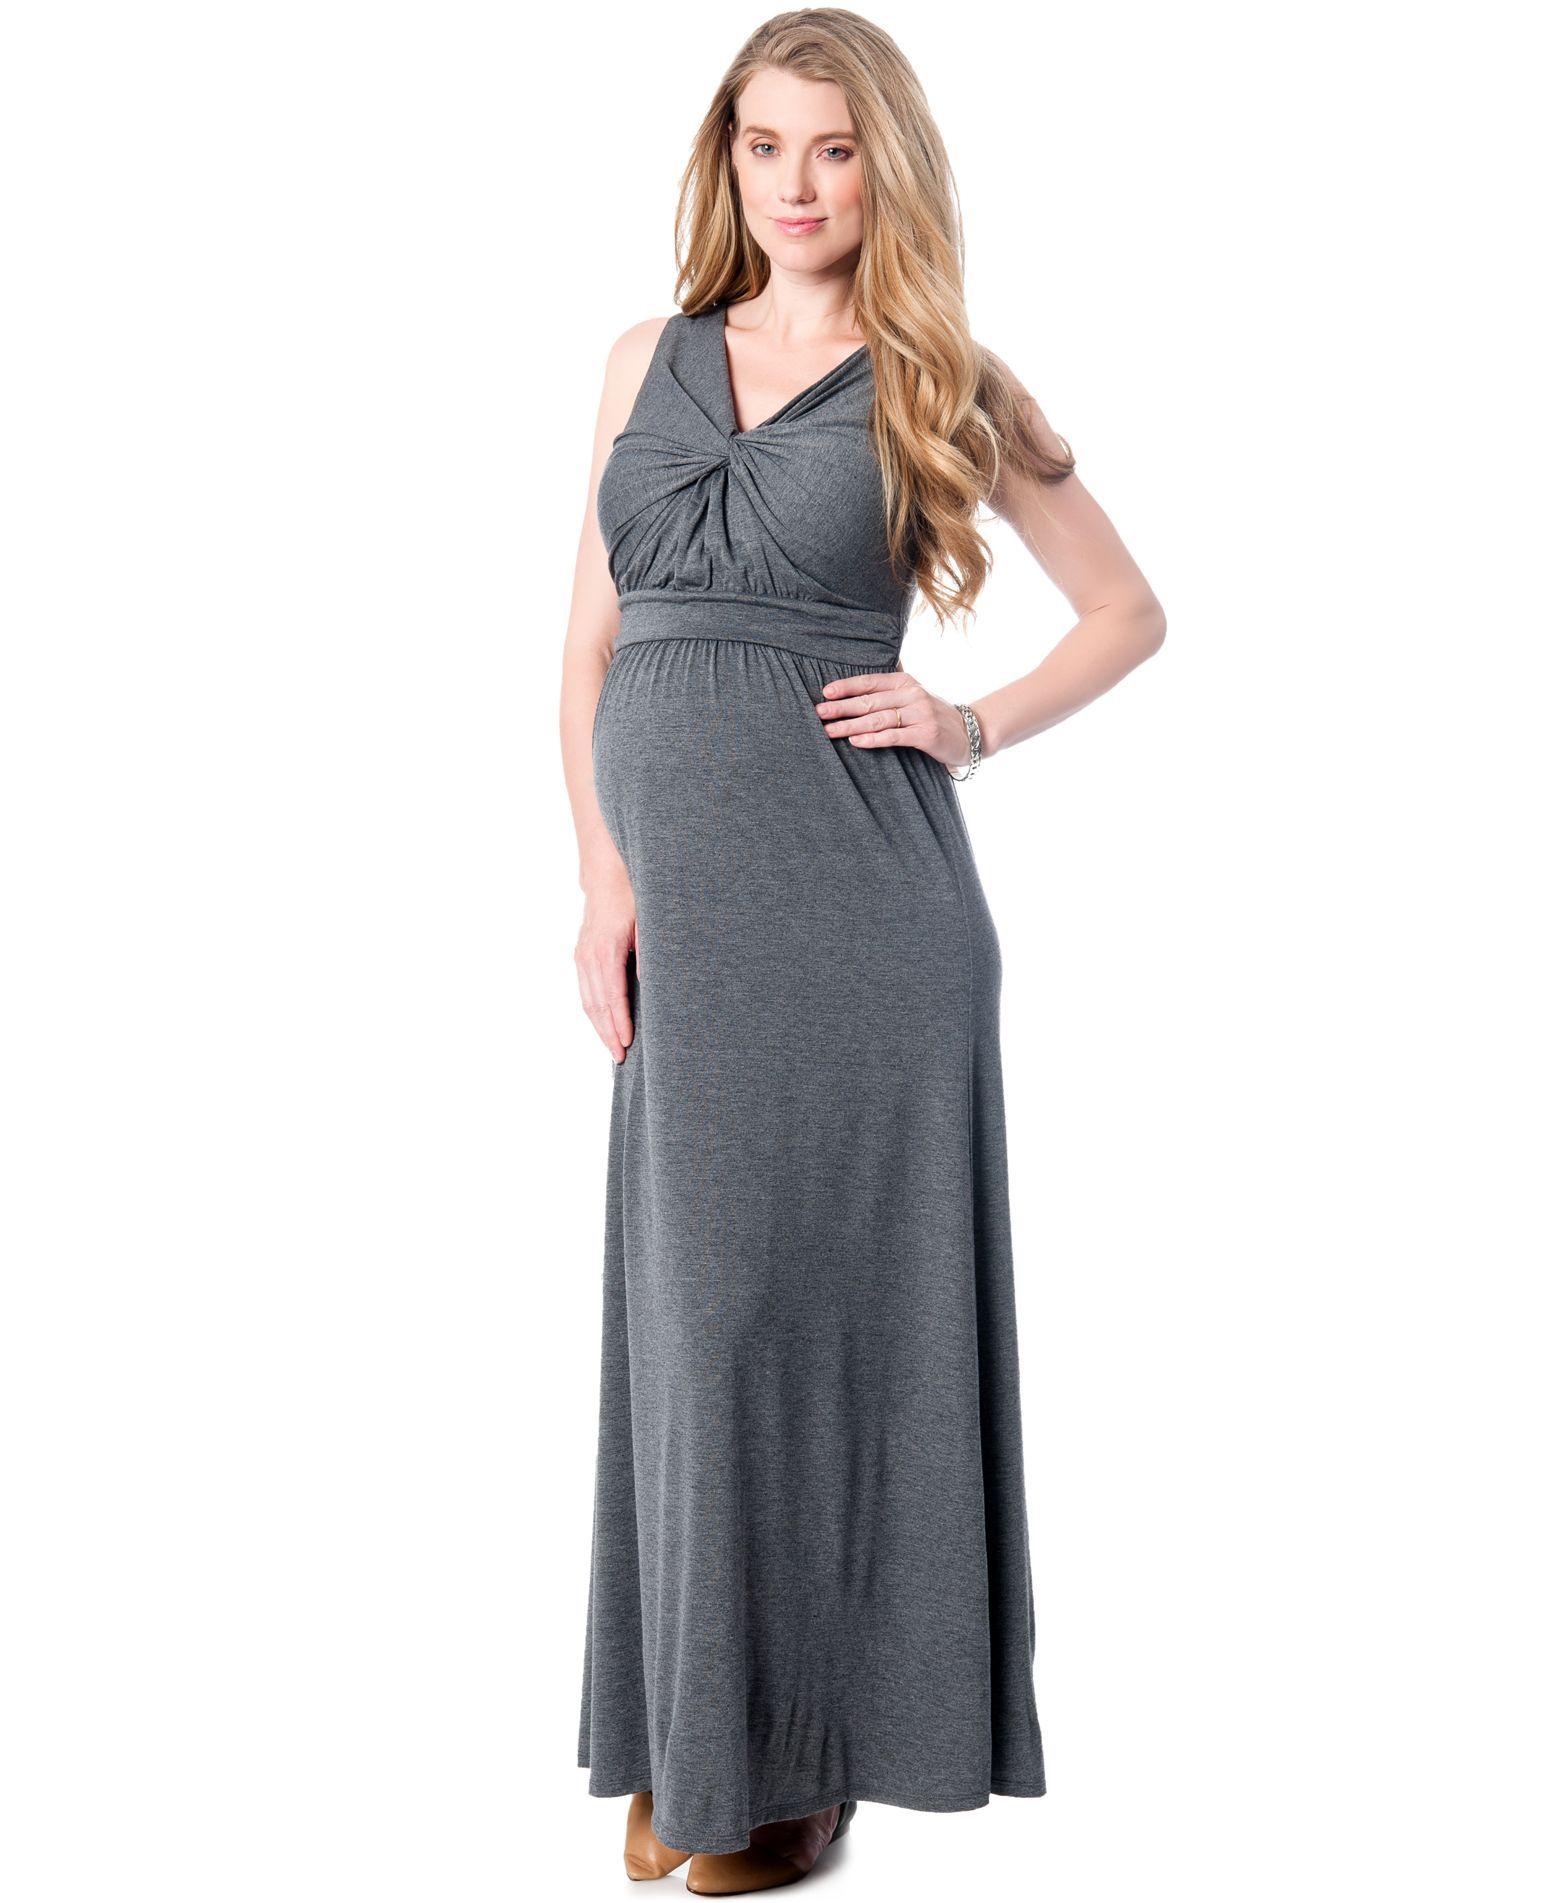 1bbe9d42b69d4 Motherhood Maternity Sleeveless Knotted-Front Maxi Dress | Bra ...